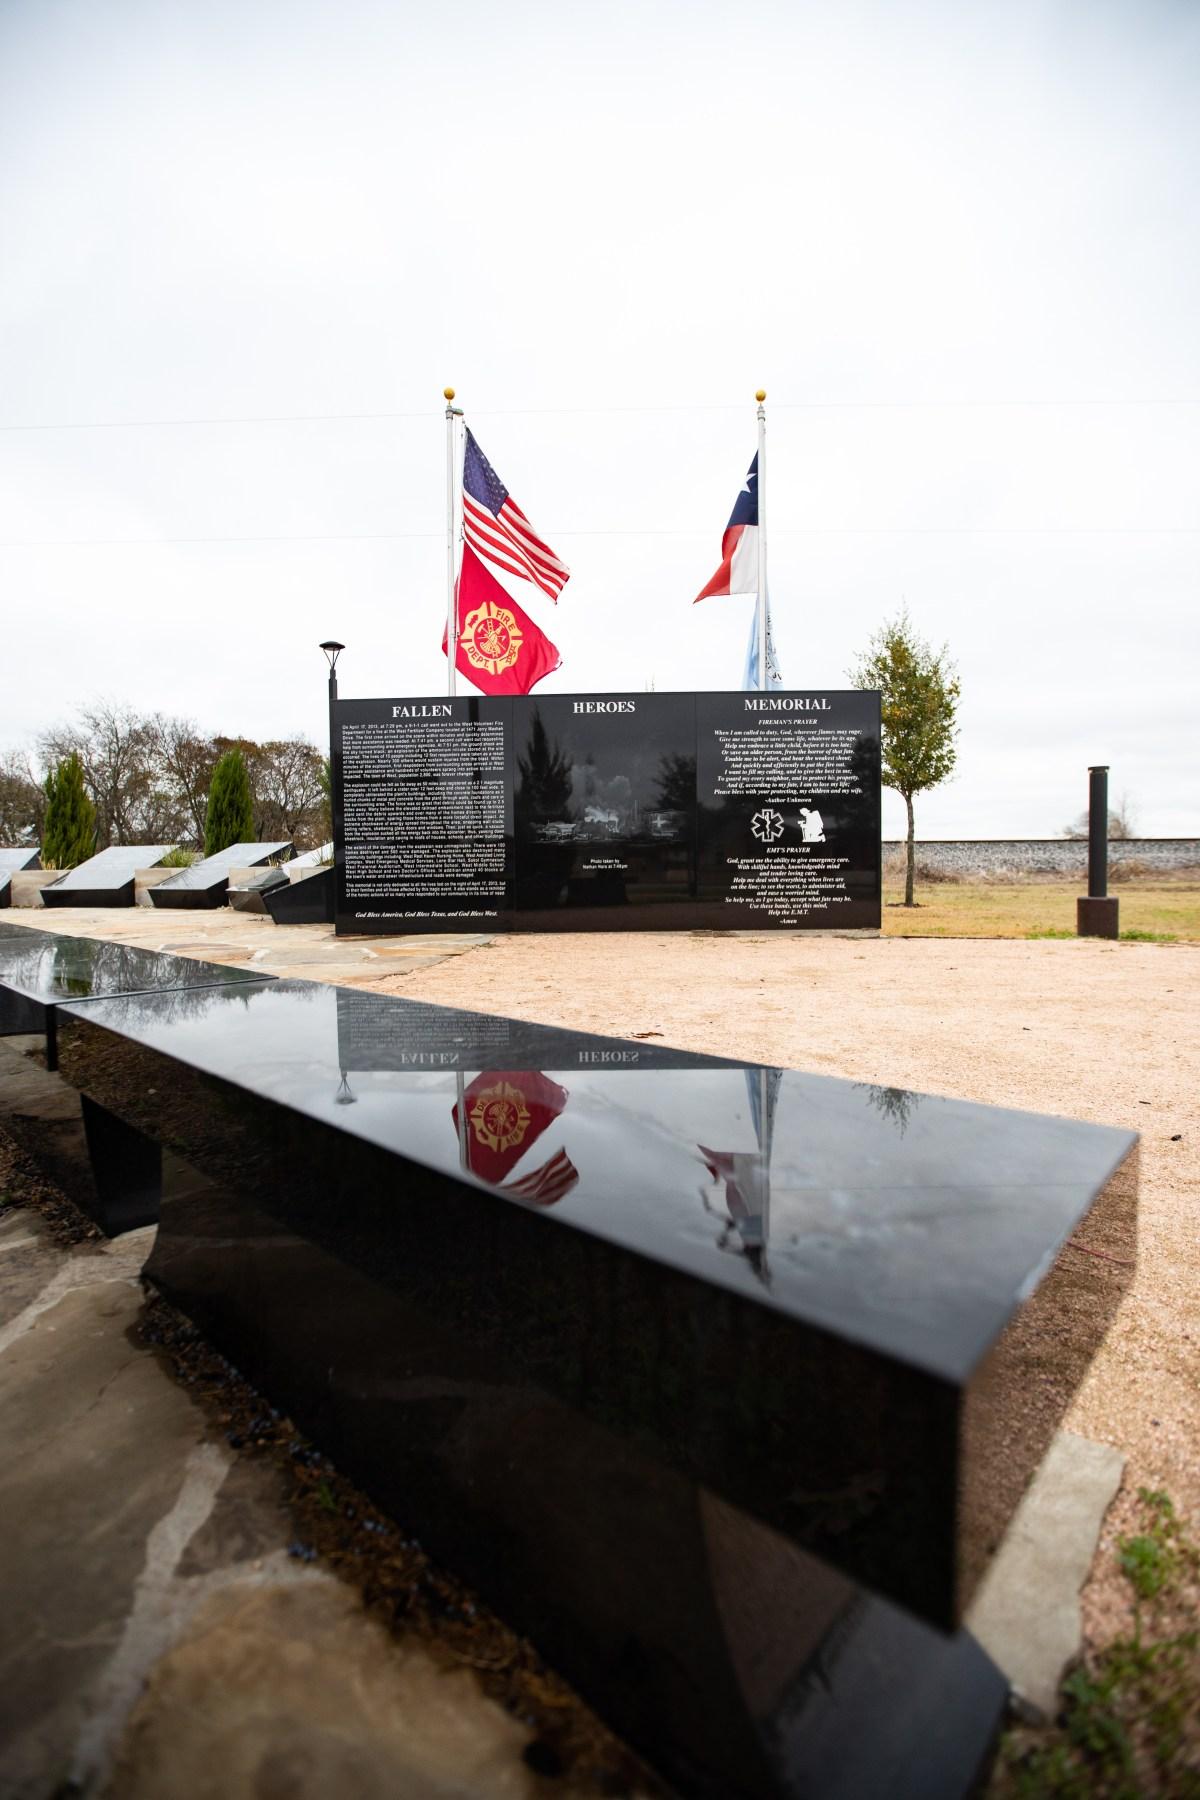 West memorial